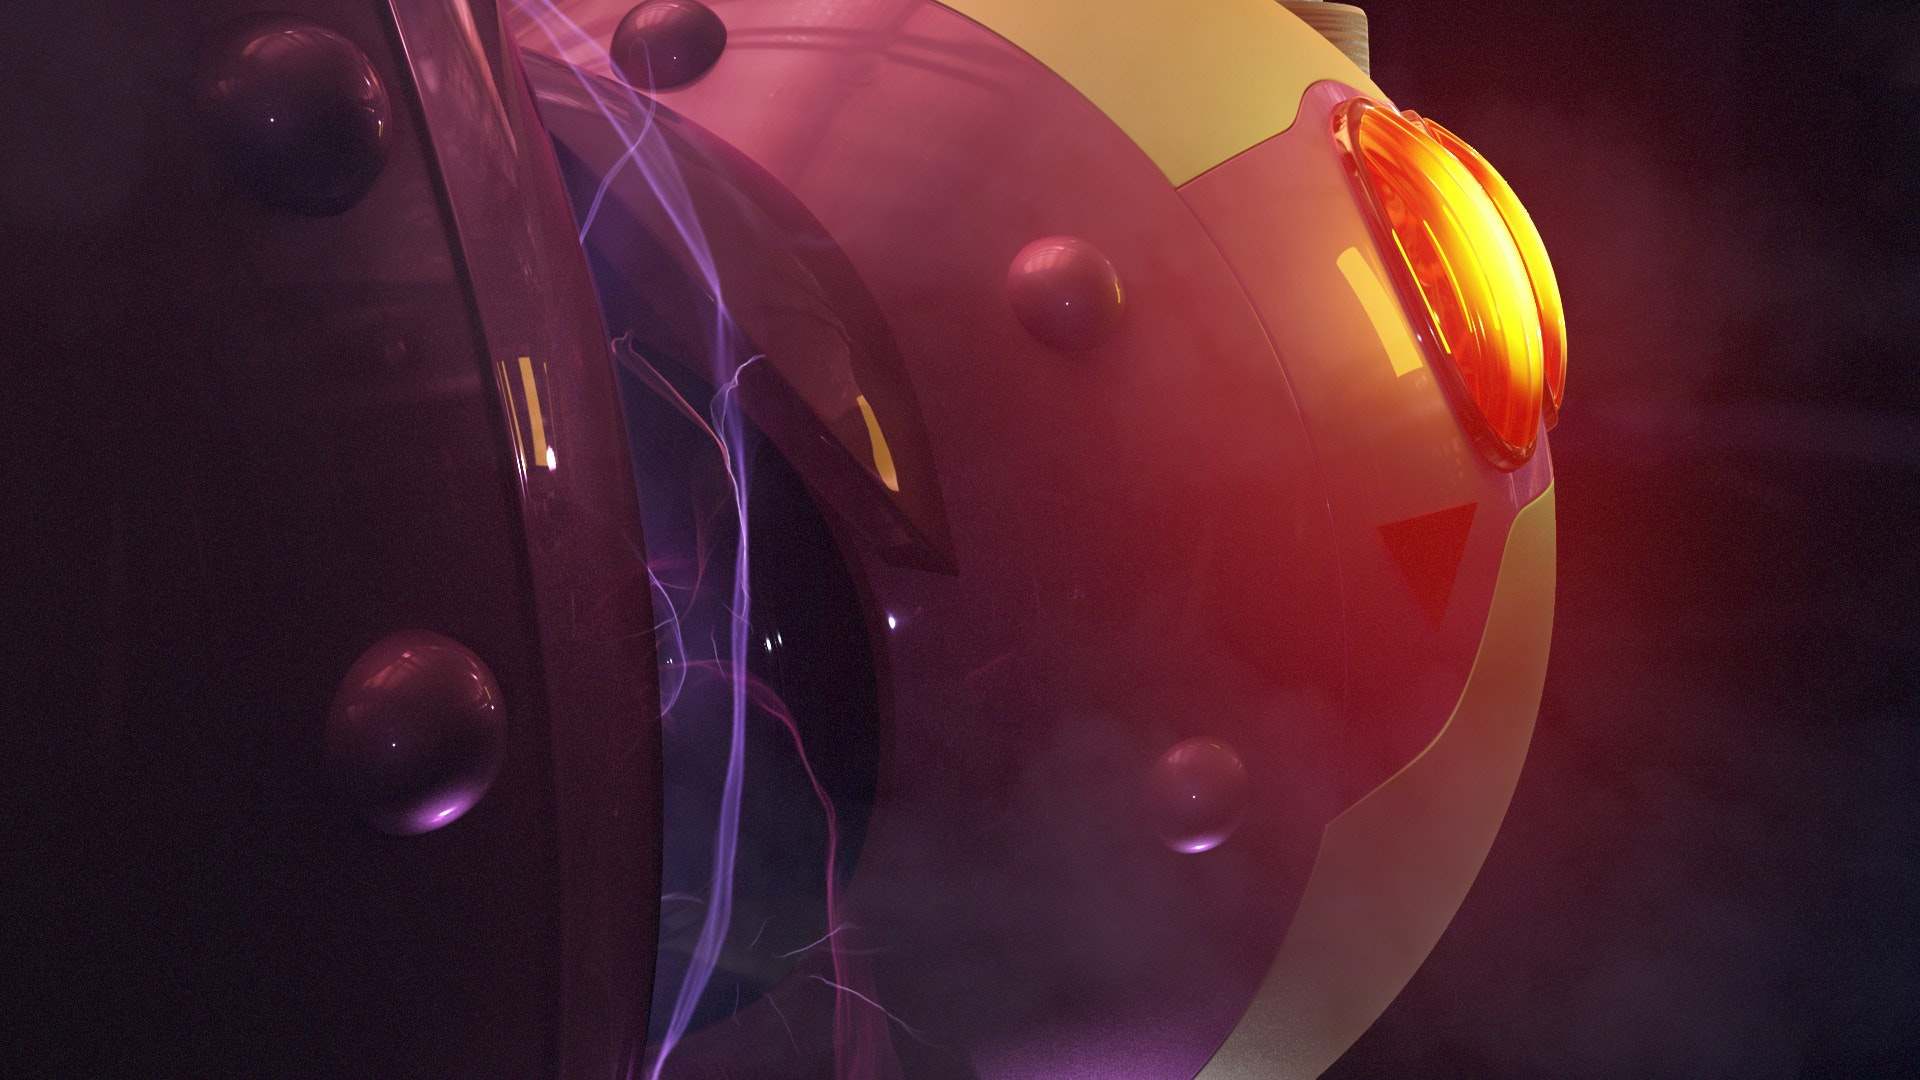 VINICIUS NALDI - Nintendo_KyrbyRobotPlanet_vinicius_v3_6